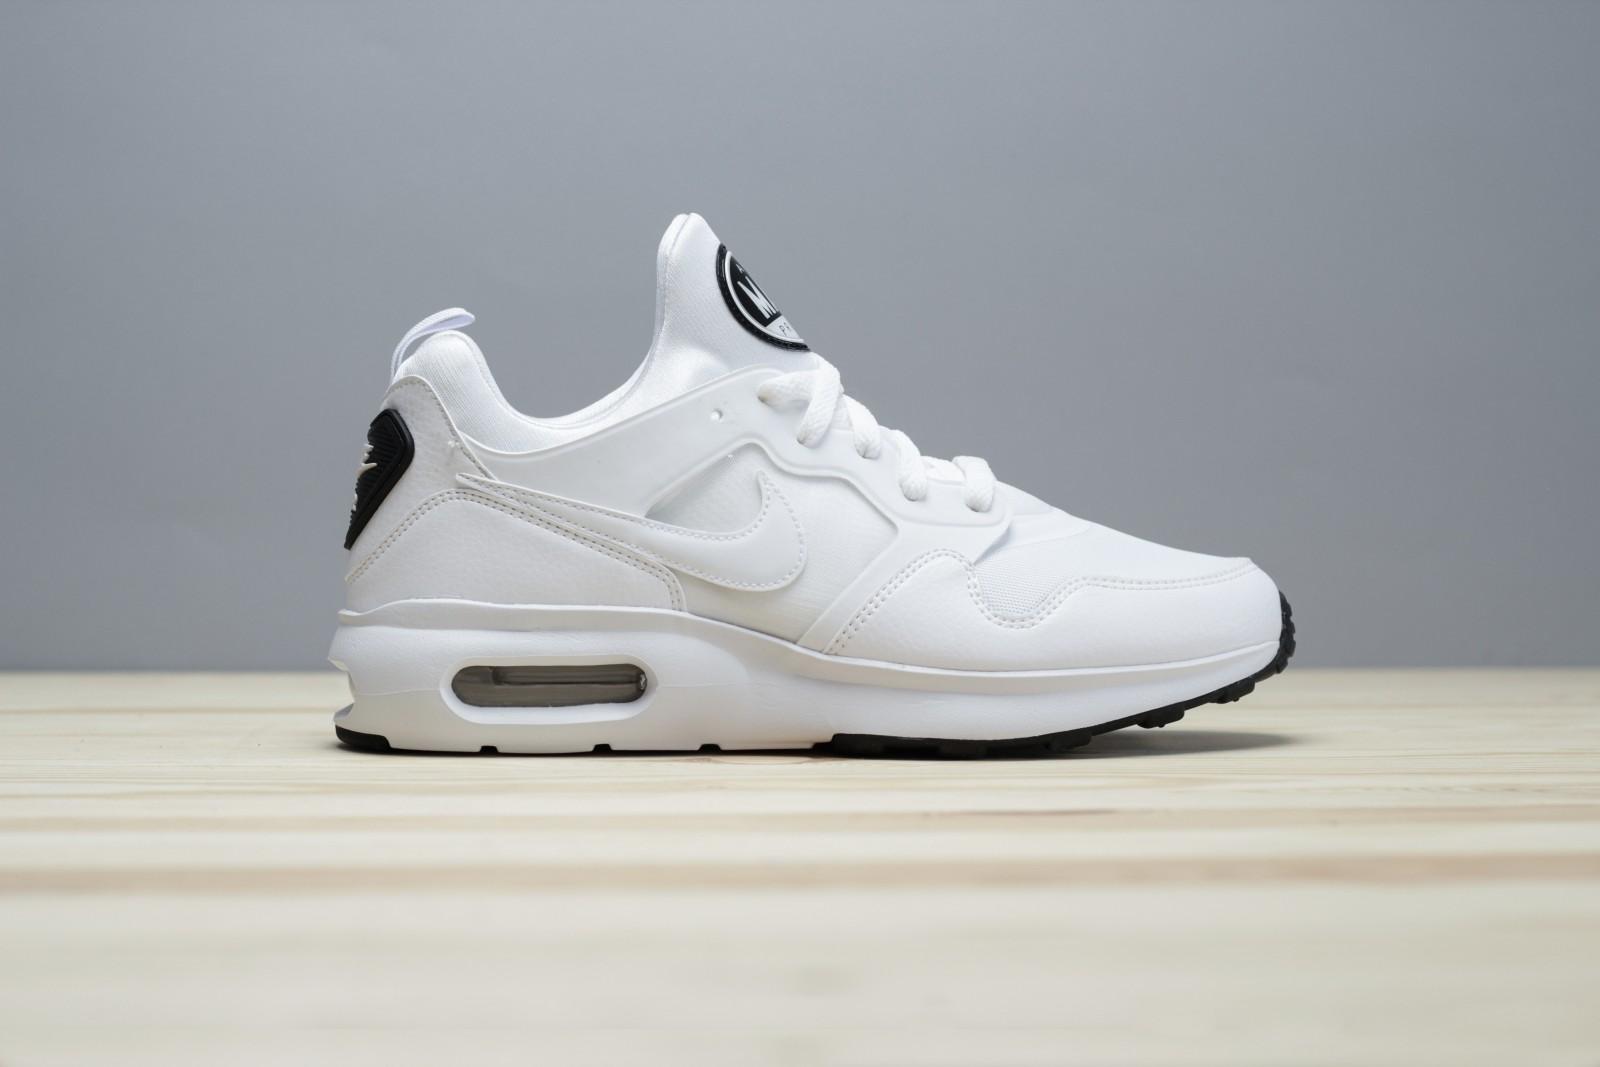 5f9e1794c22 Pánské Tenisky Nike AIR MAX PRIME